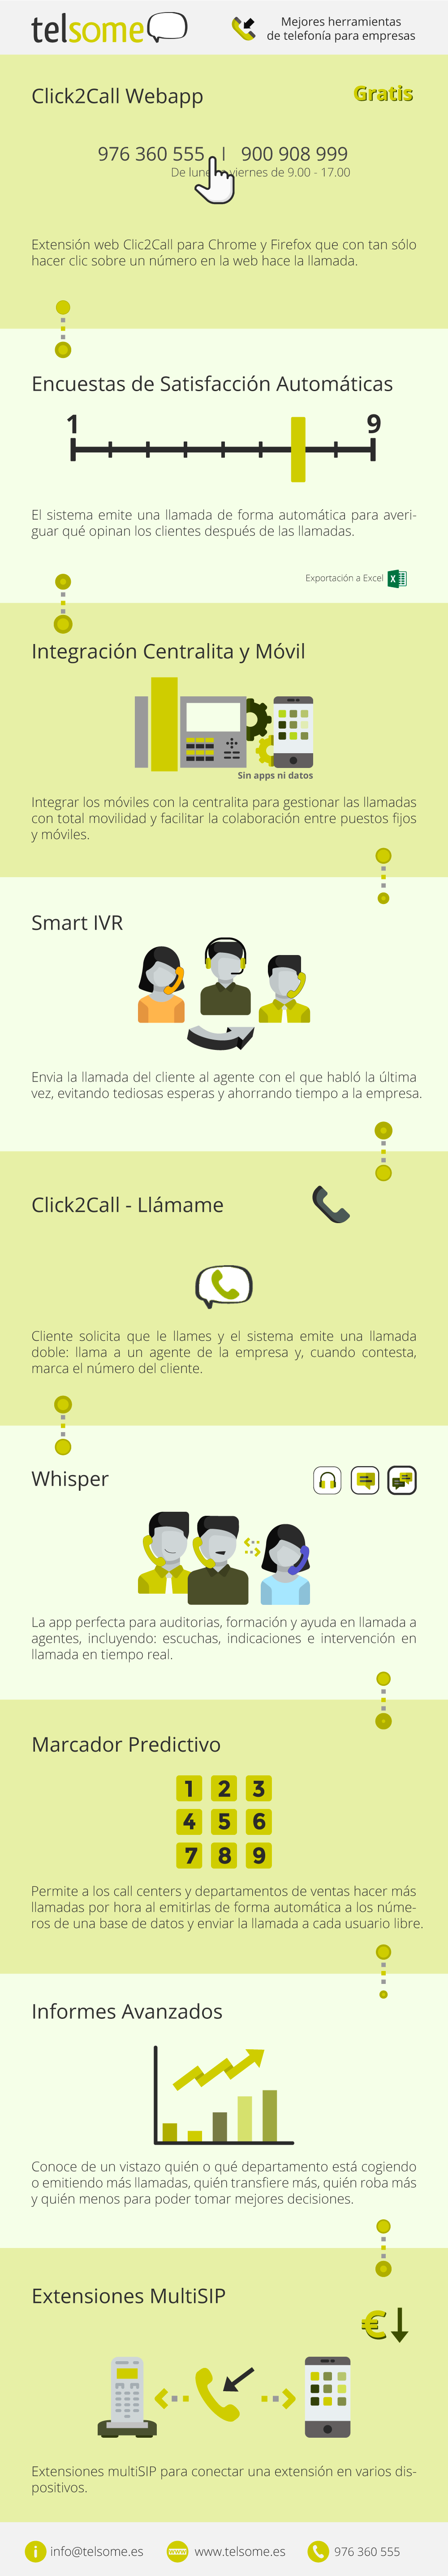 telsome infografia empresa mejores herramientas telefonia